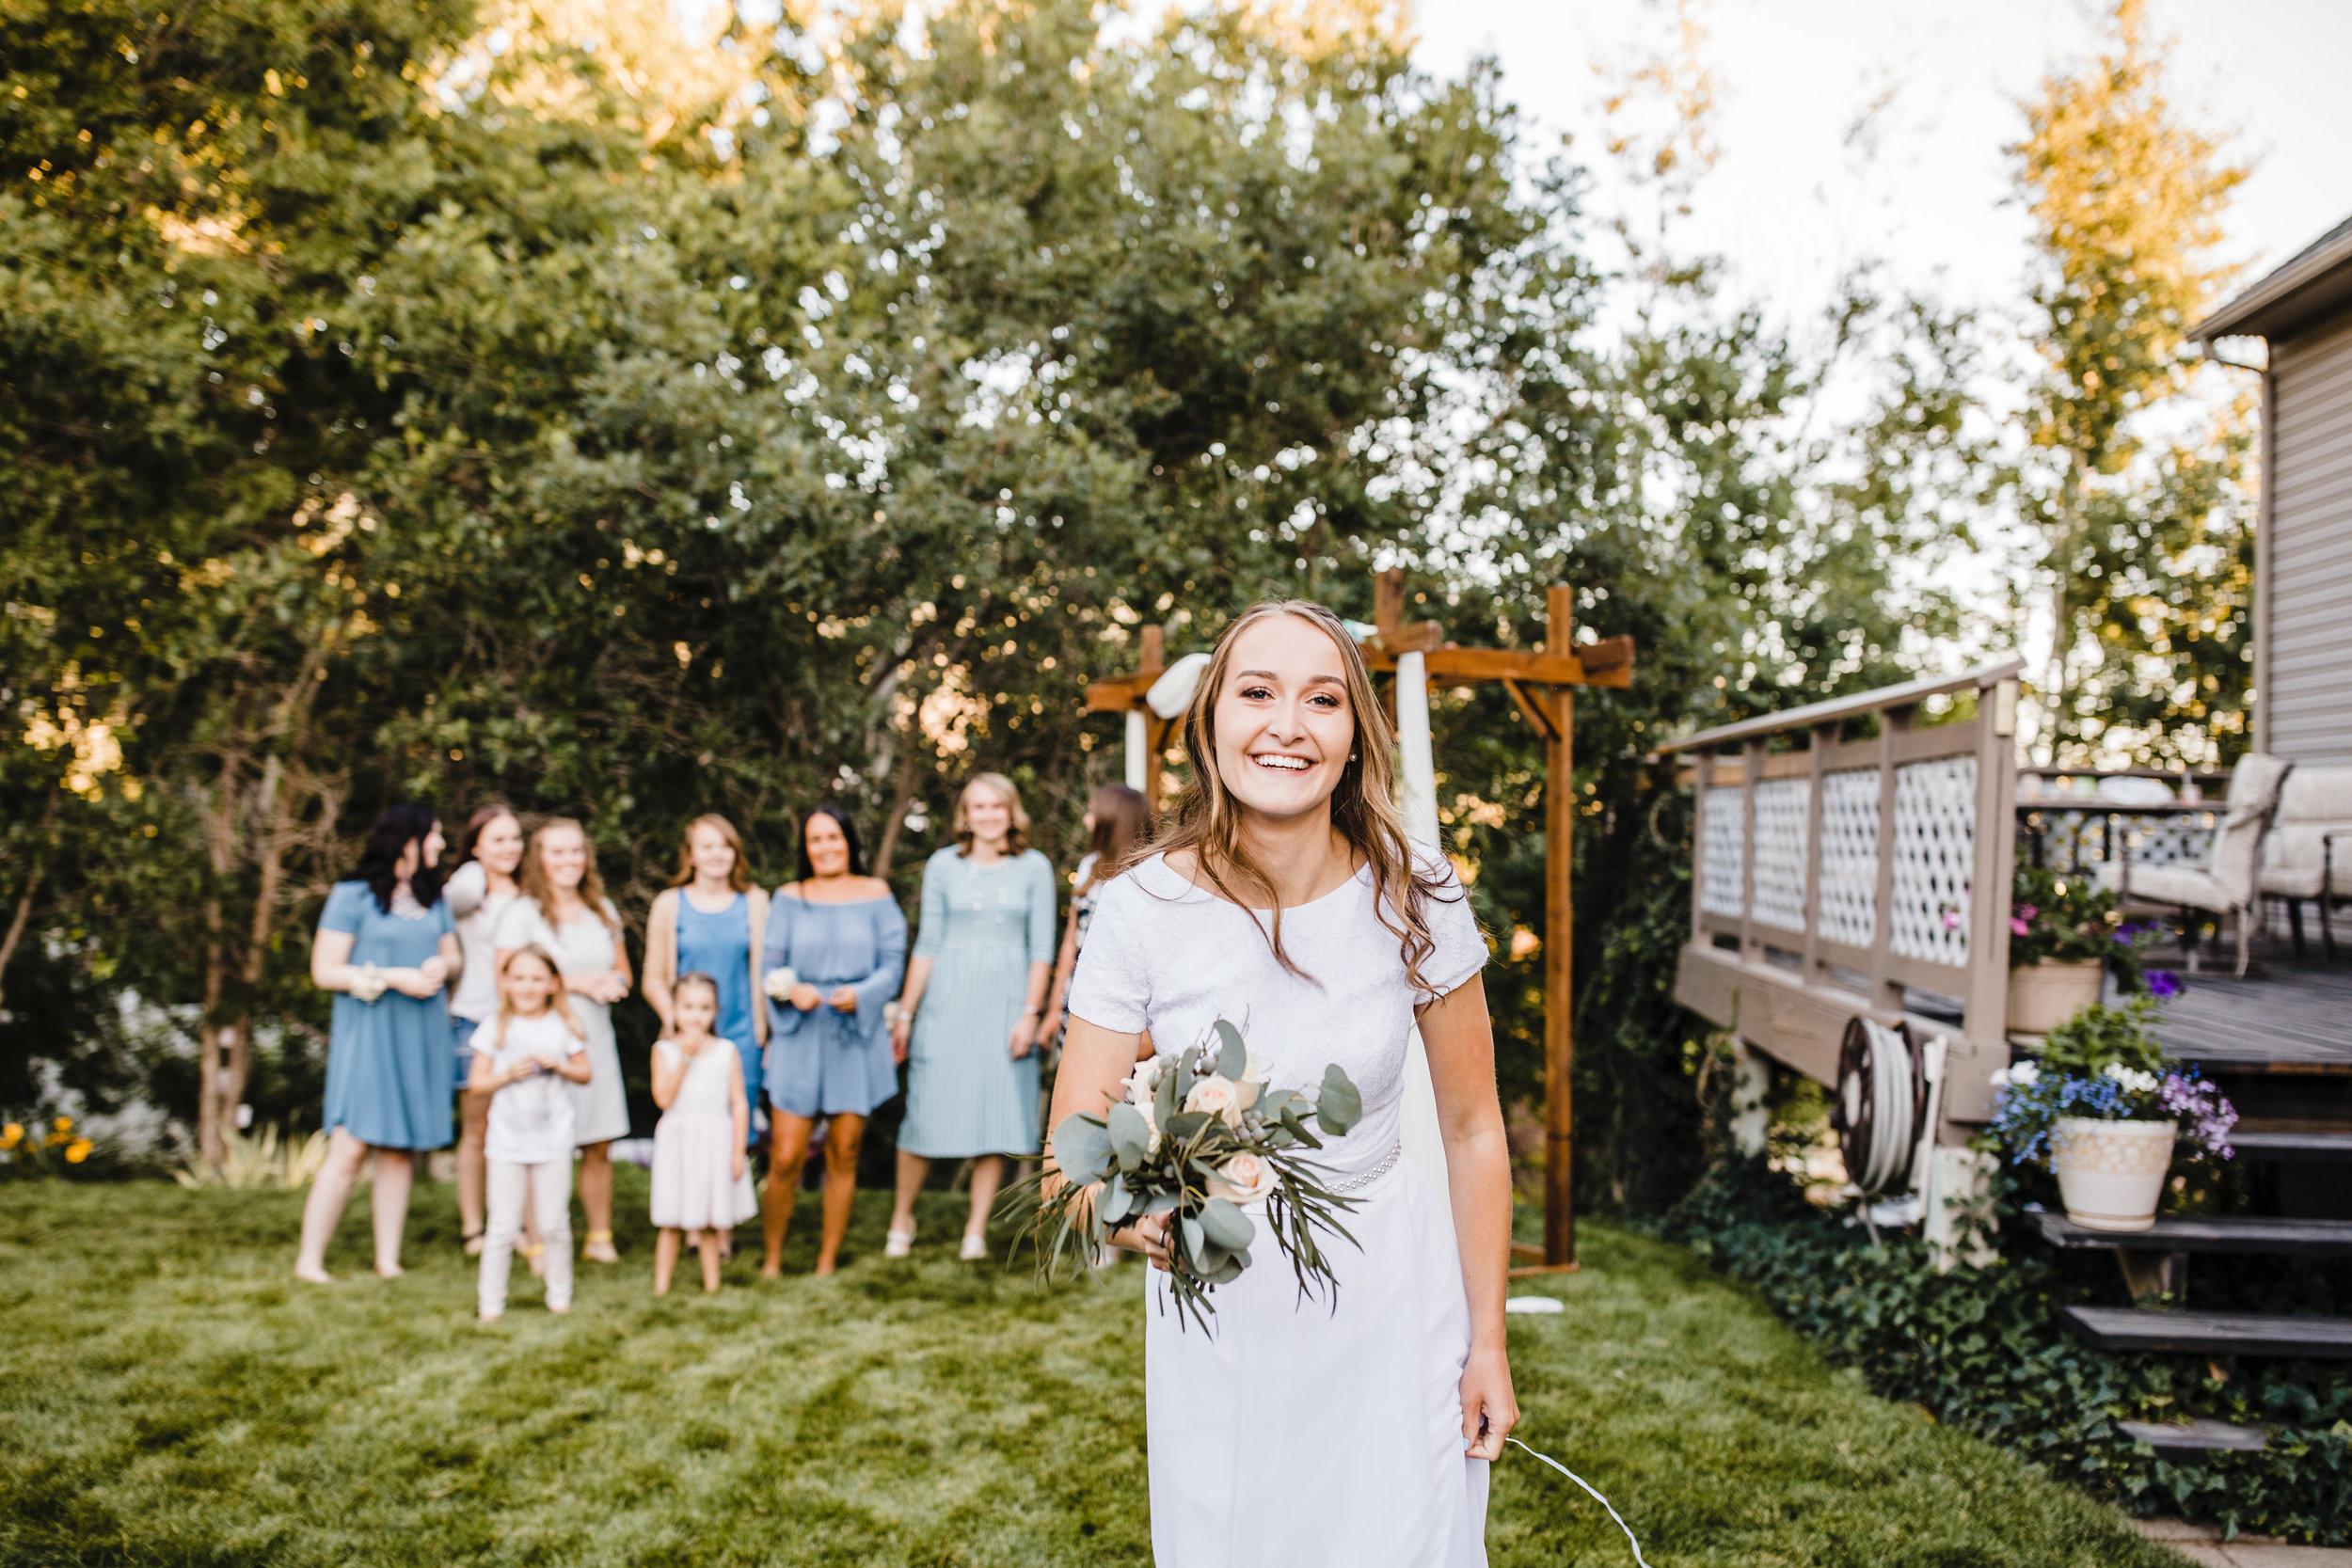 cache valley wedding photographer outdoor wedding reception bouquet toss blue bridesmaids